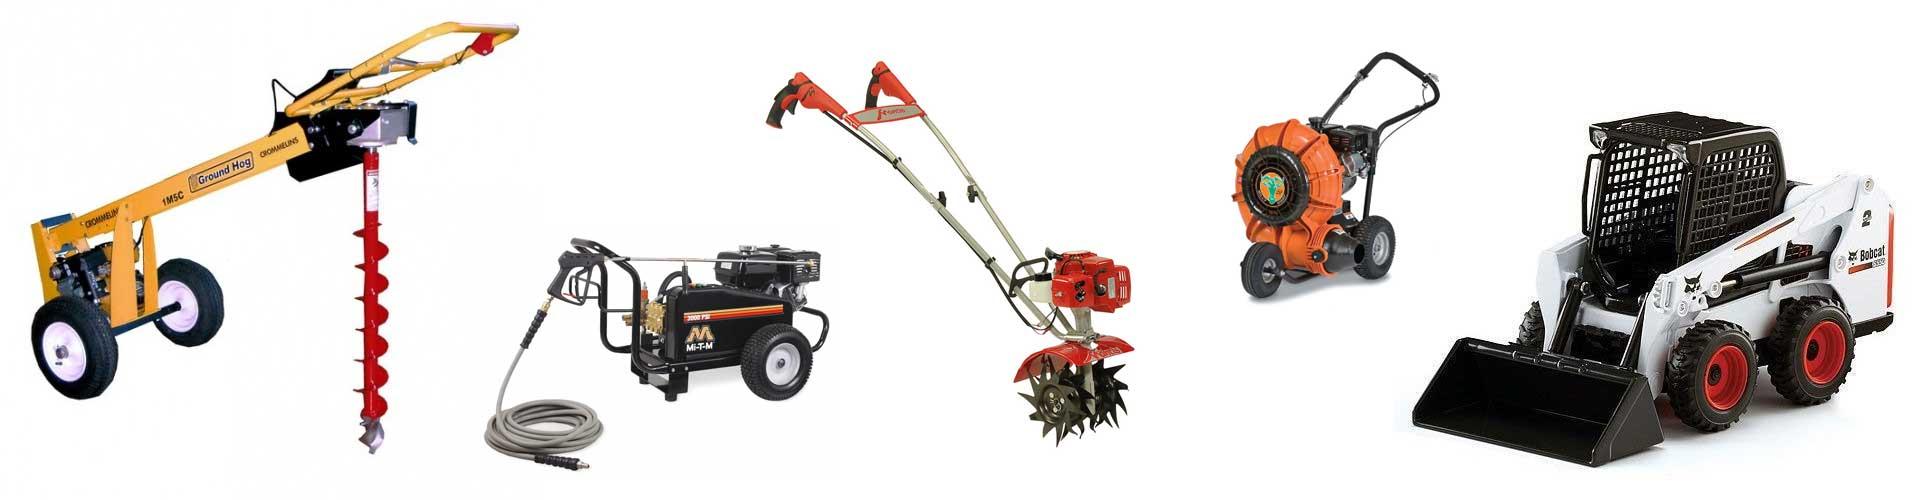 equipment rental auburn portland kittery bangor maine